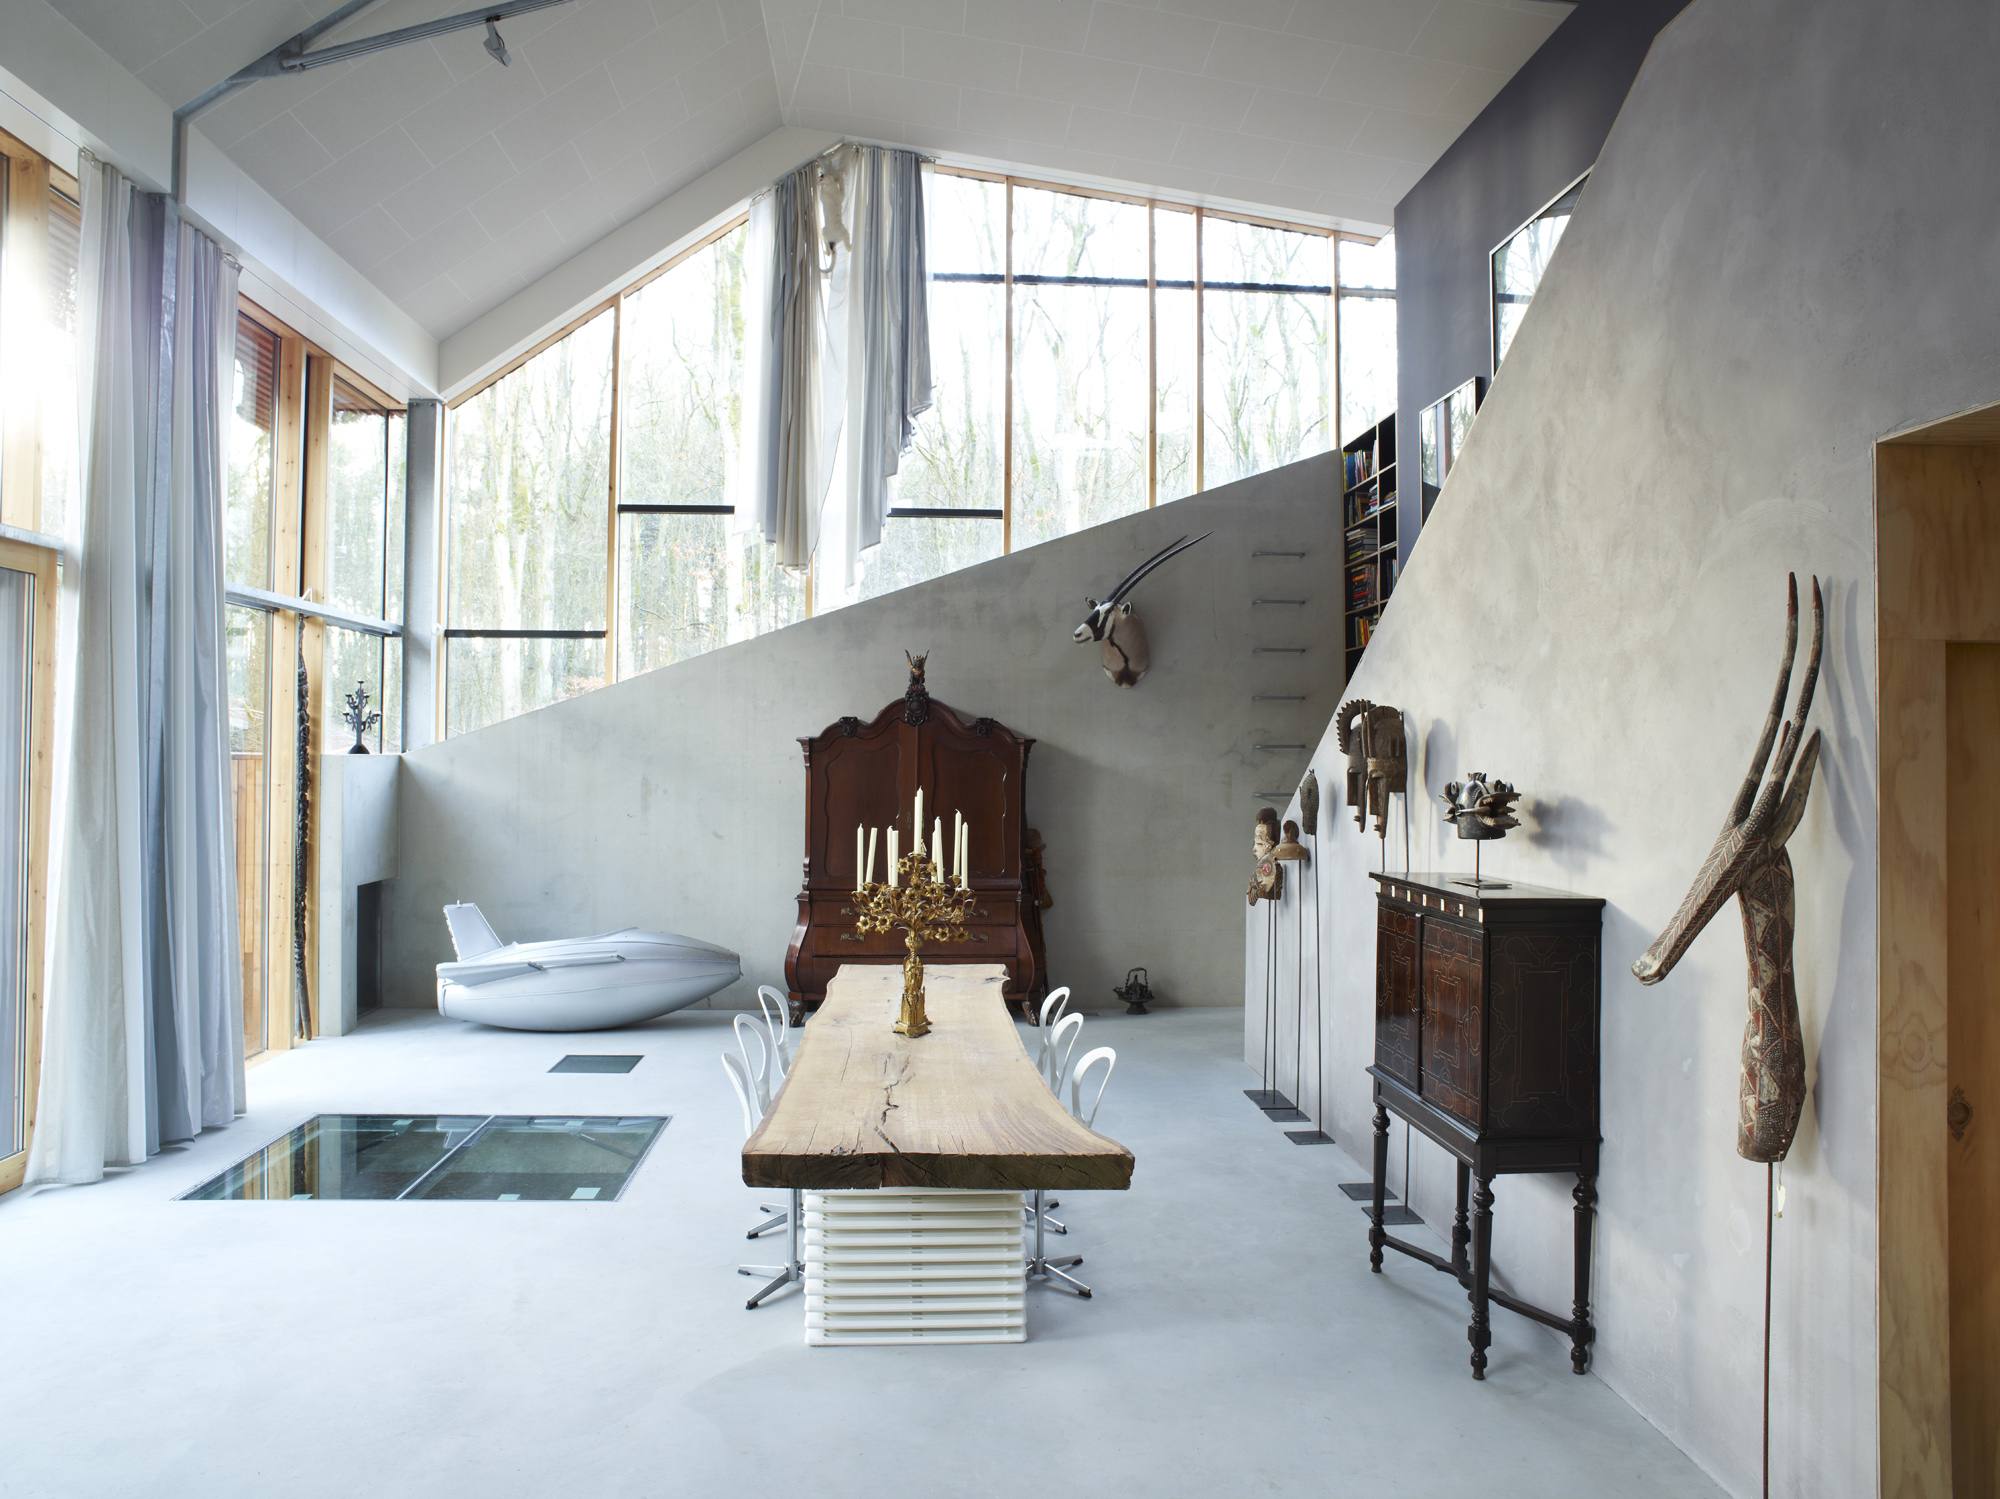 Dutch Mountain Woning : Dutch mountain wordt als kunstwerk en woning verkocht de architect